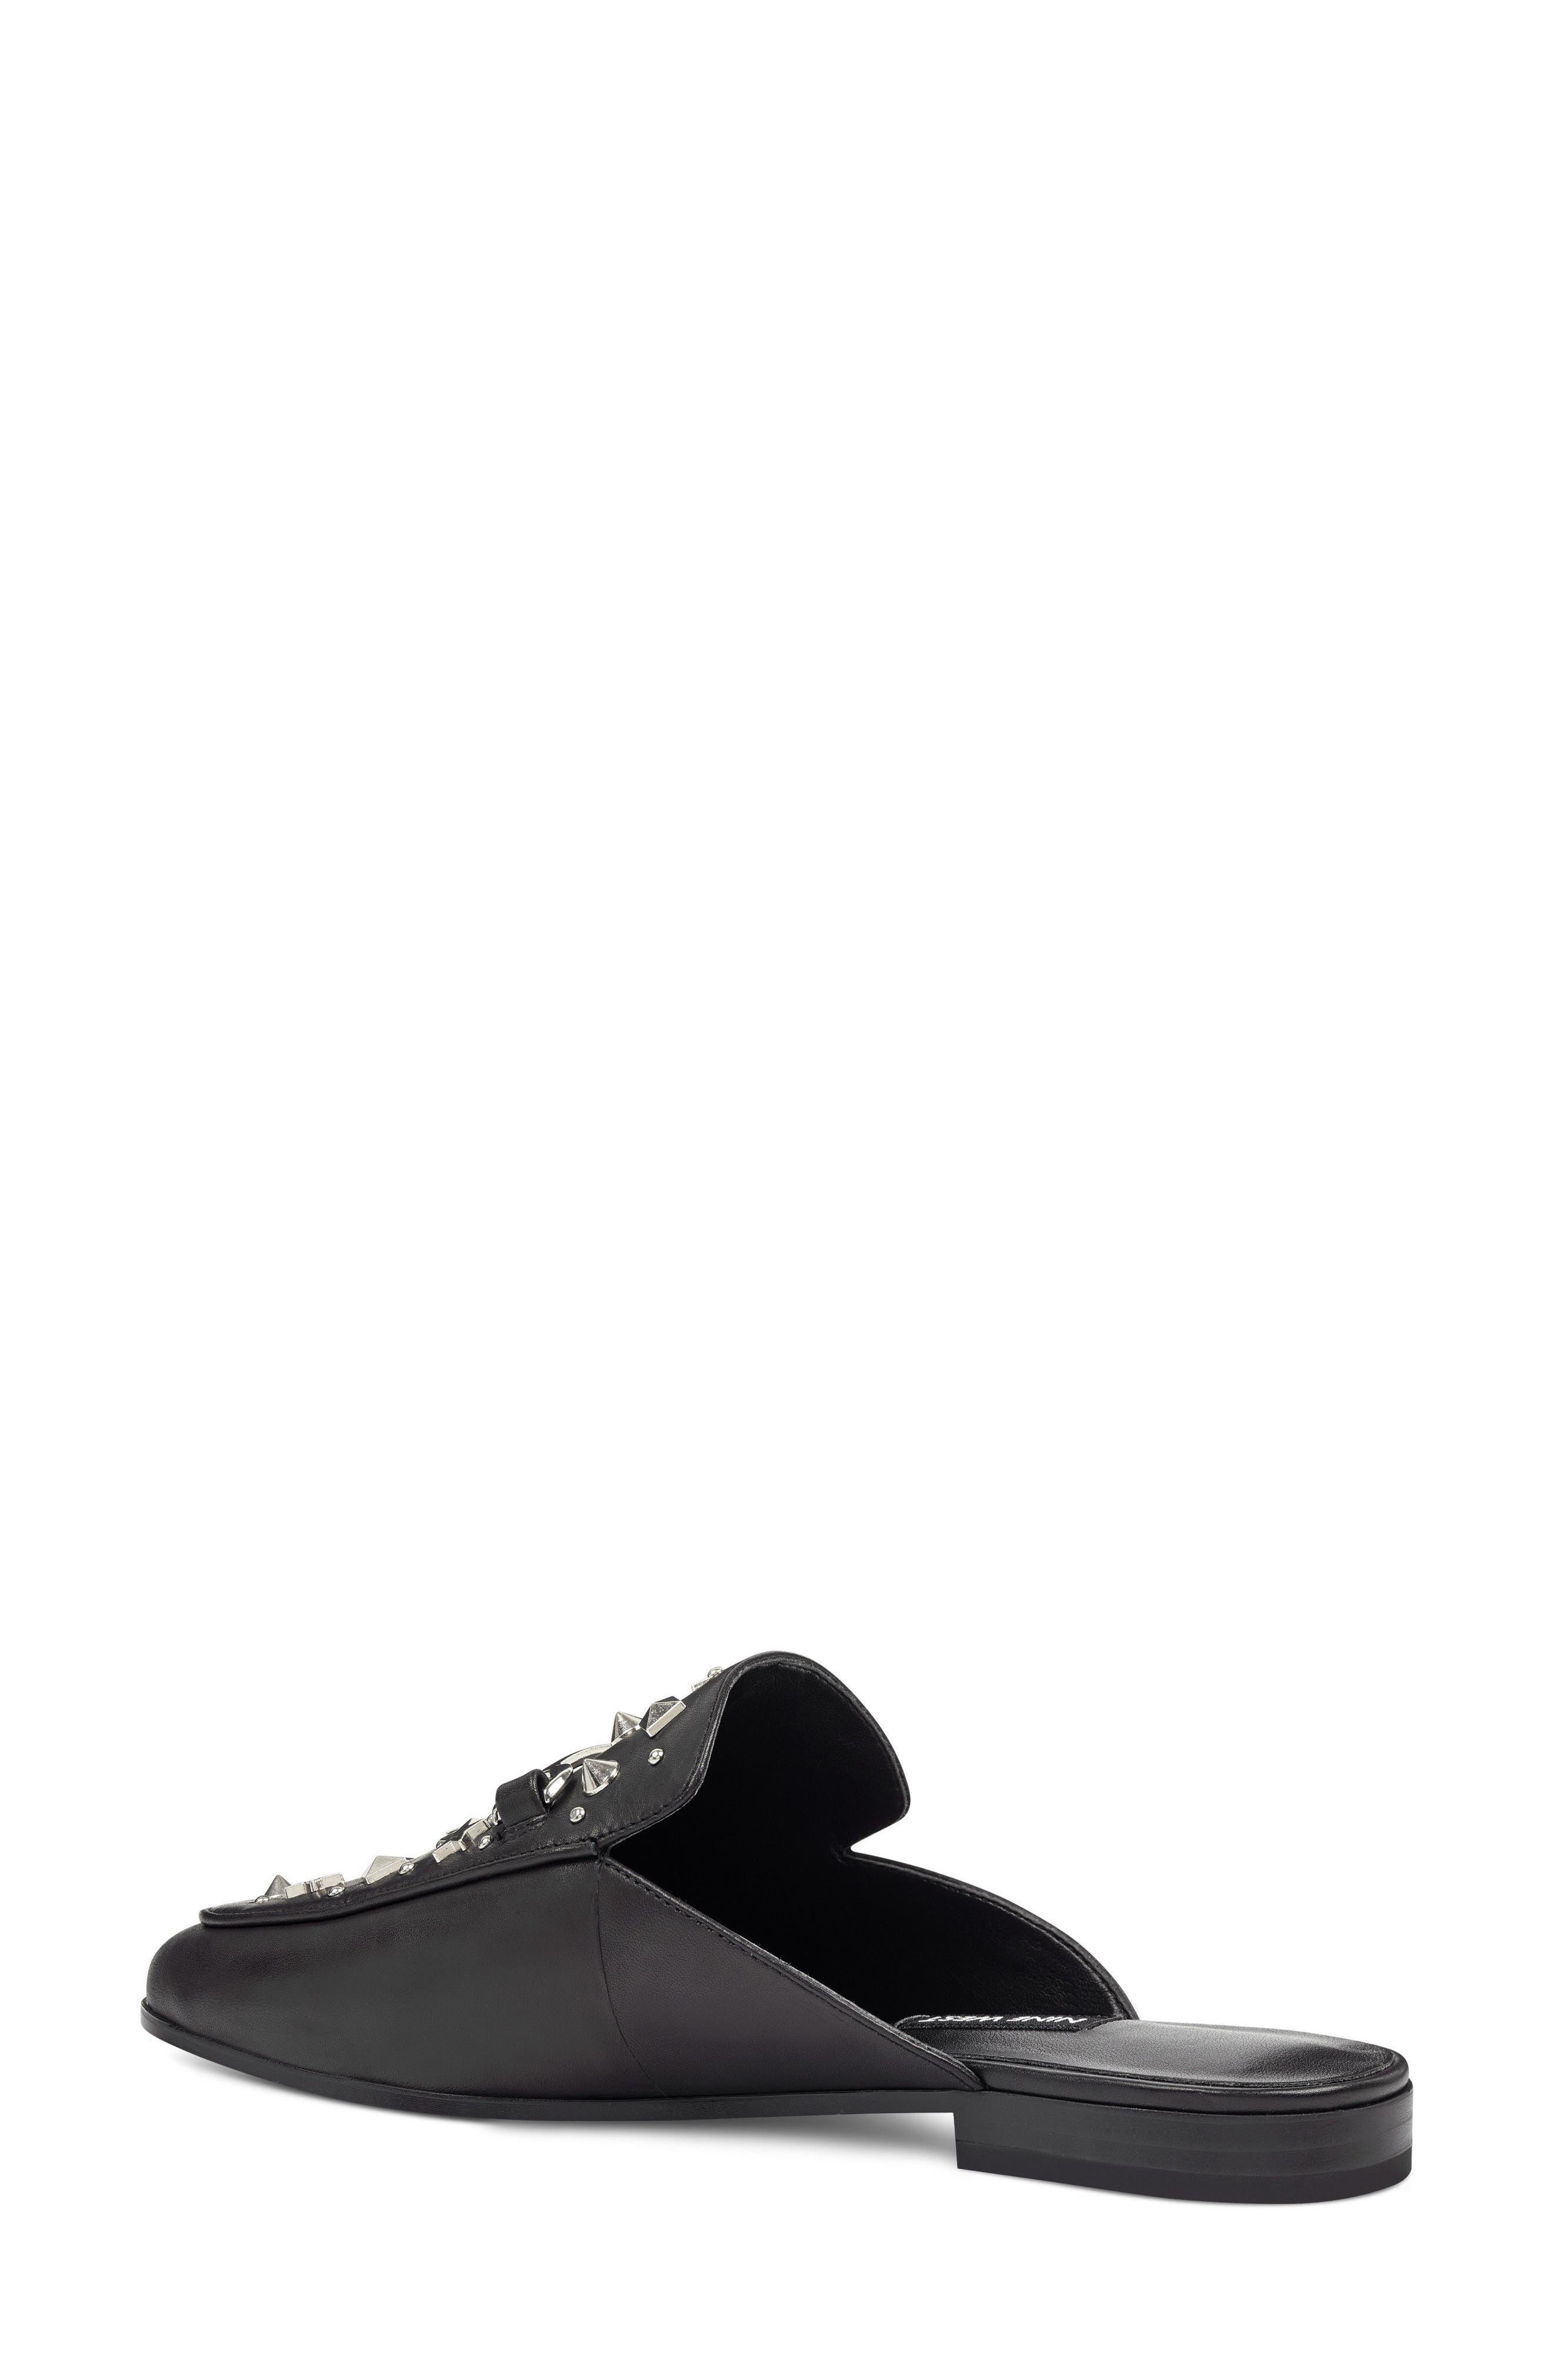 Welynne Mule,                             Alternate thumbnail 2, color,                             Black Leather